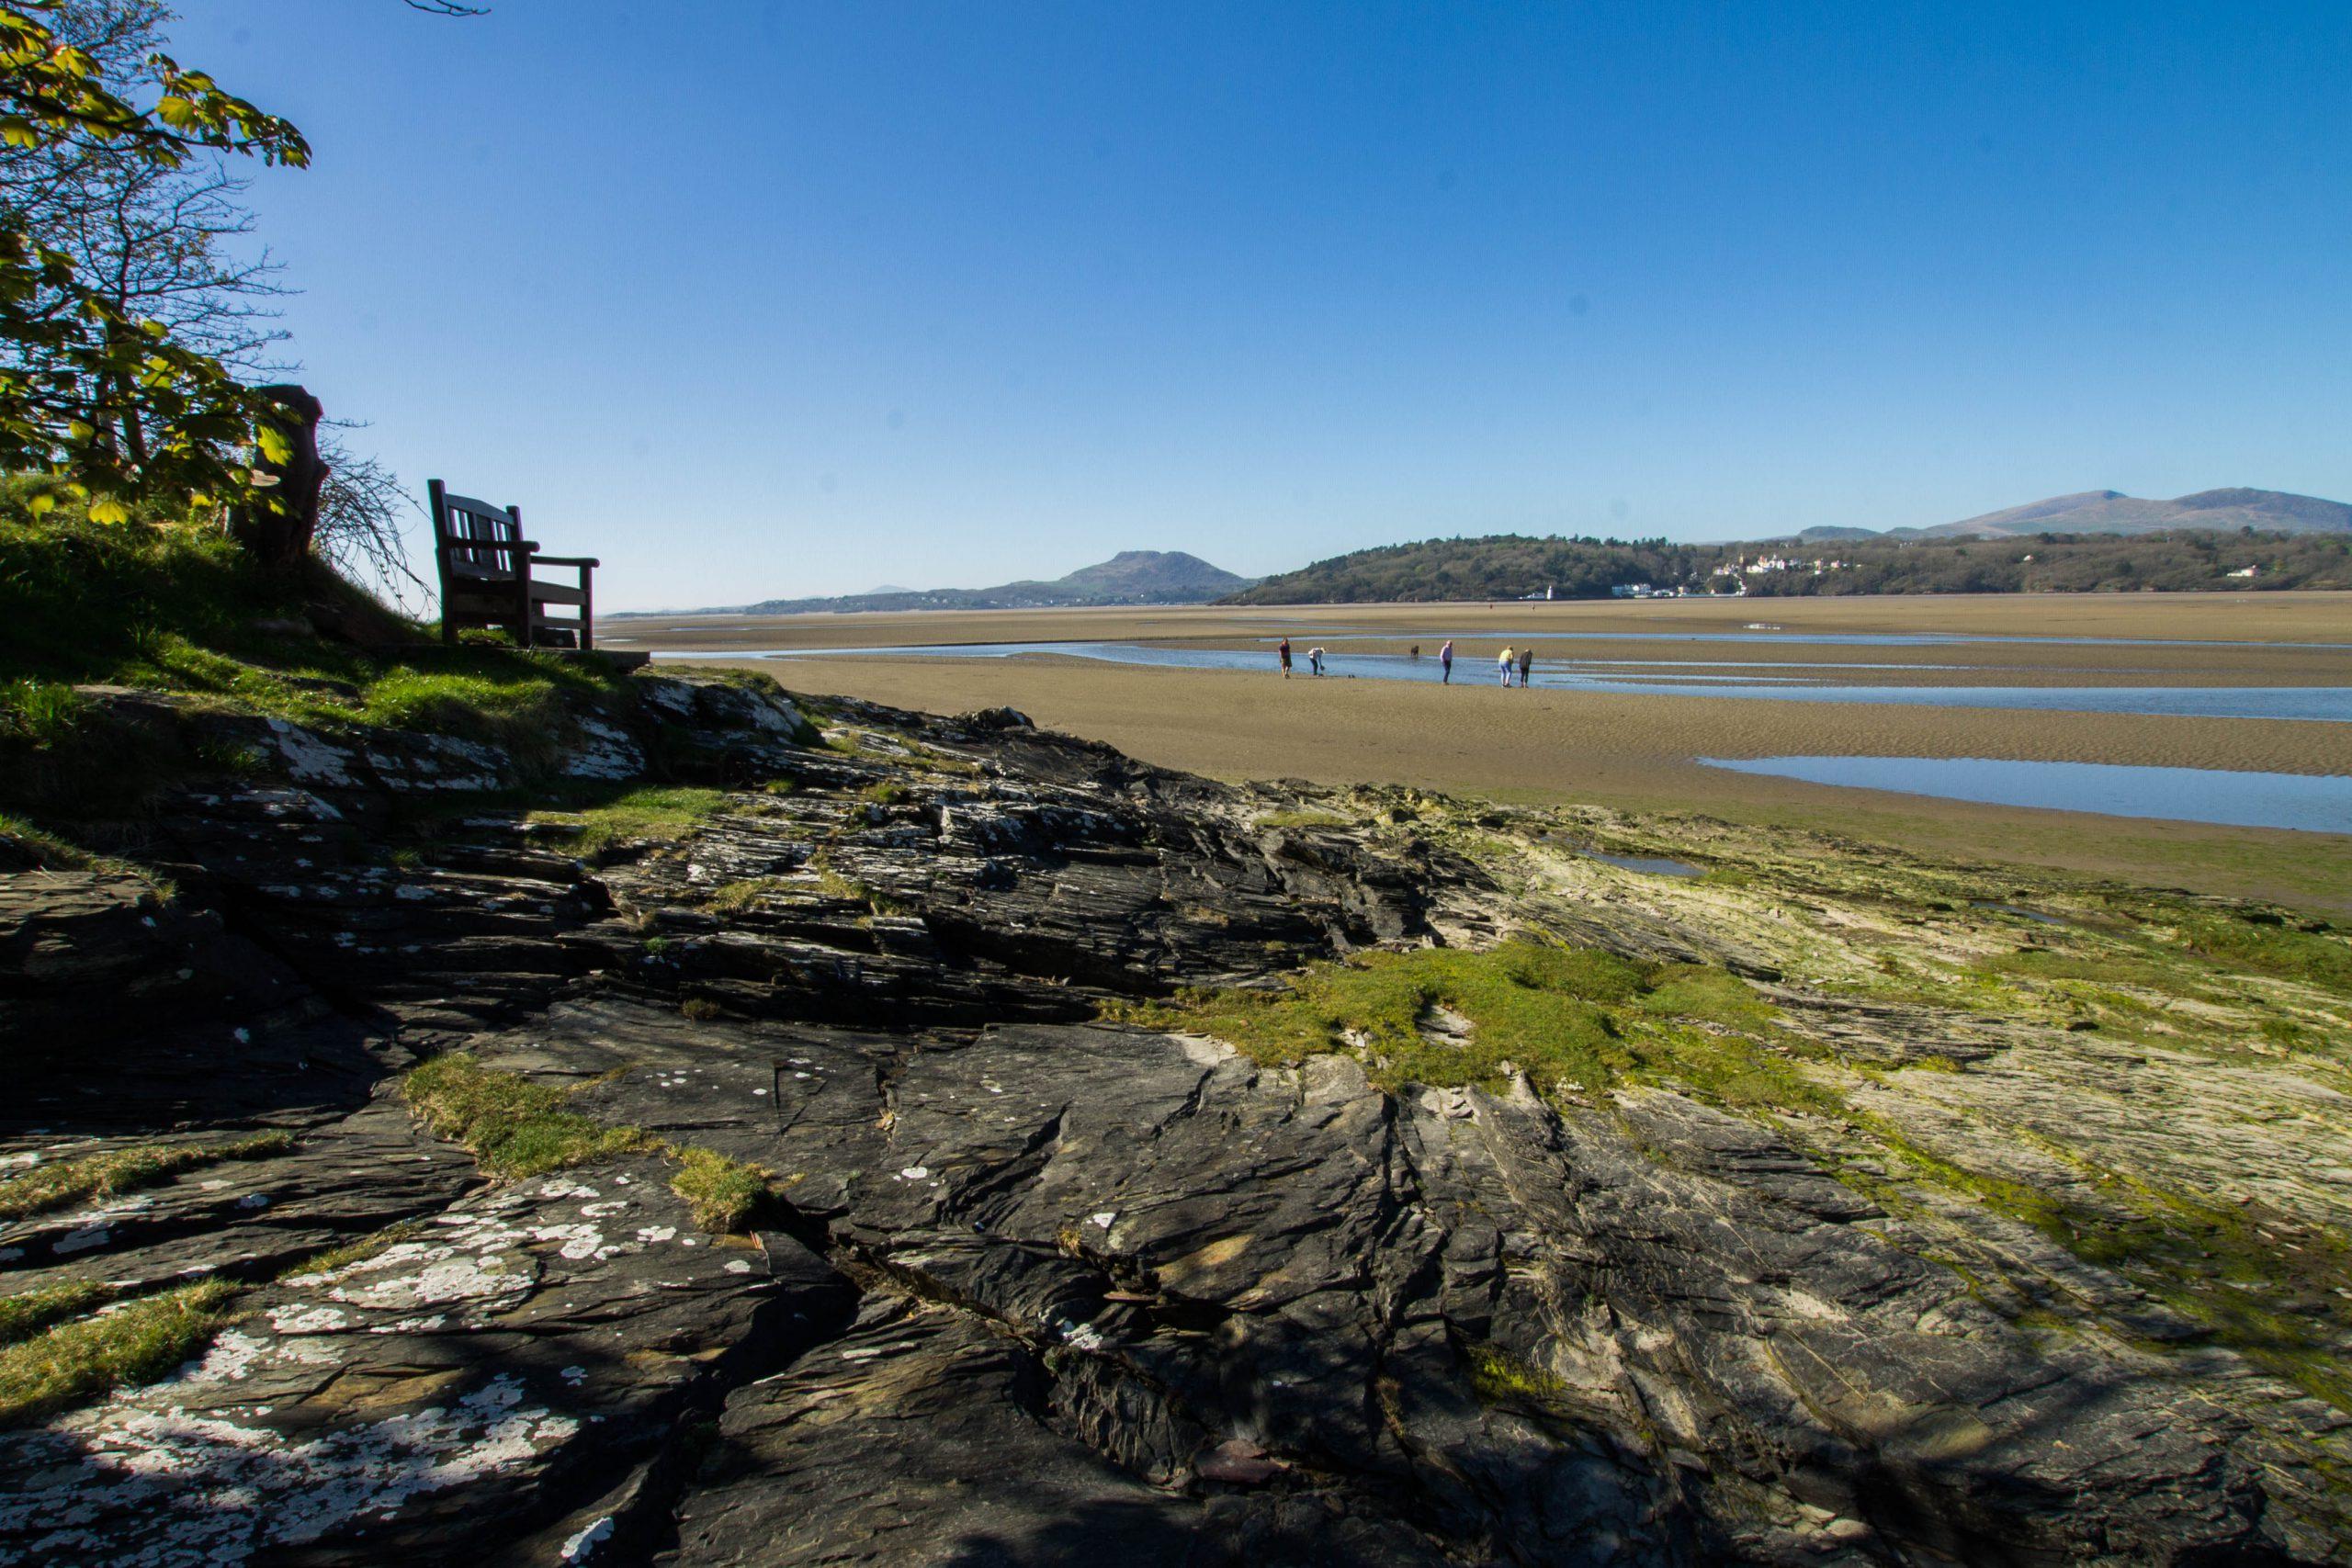 Views toward Portmeirion from the Ynys Estuary